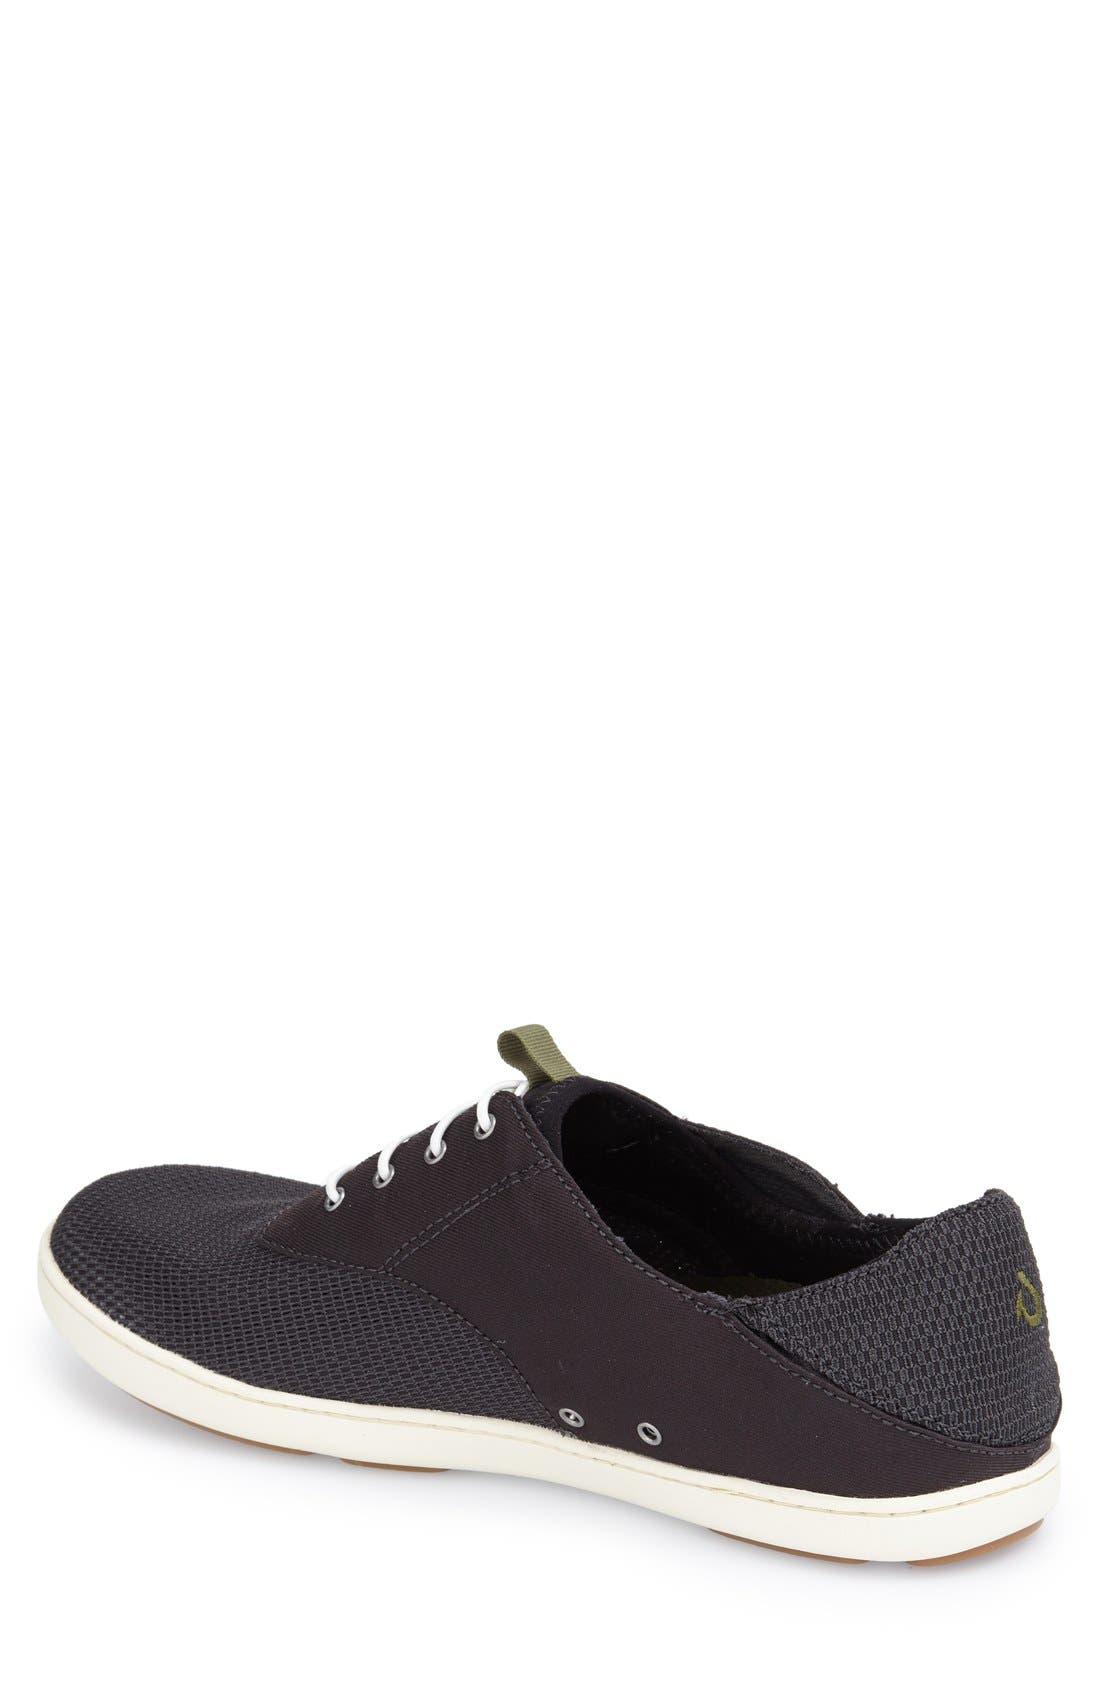 'Nohea Moku' Sneaker,                             Alternate thumbnail 2, color,                             Black/ Black